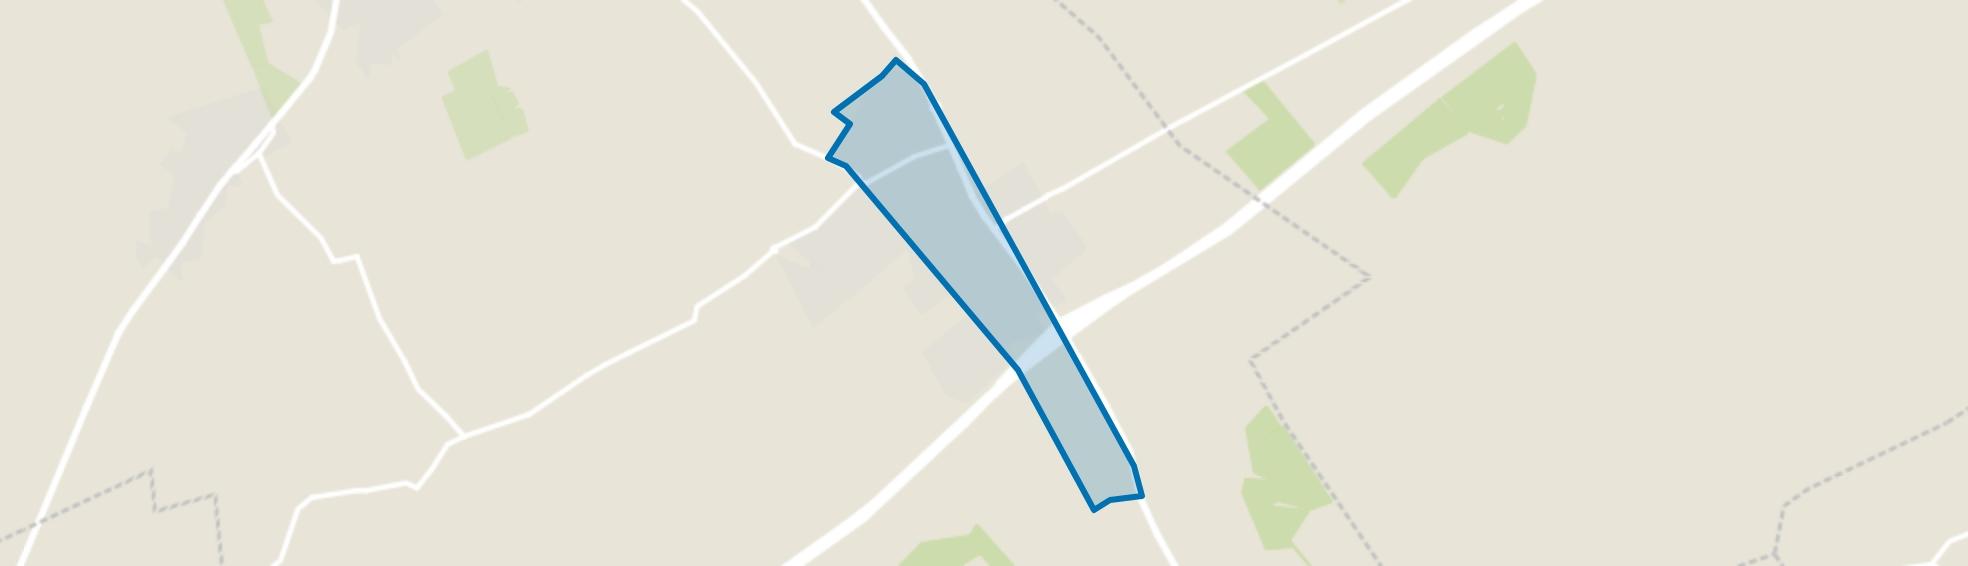 't Harde-Centrum, 't Harde map